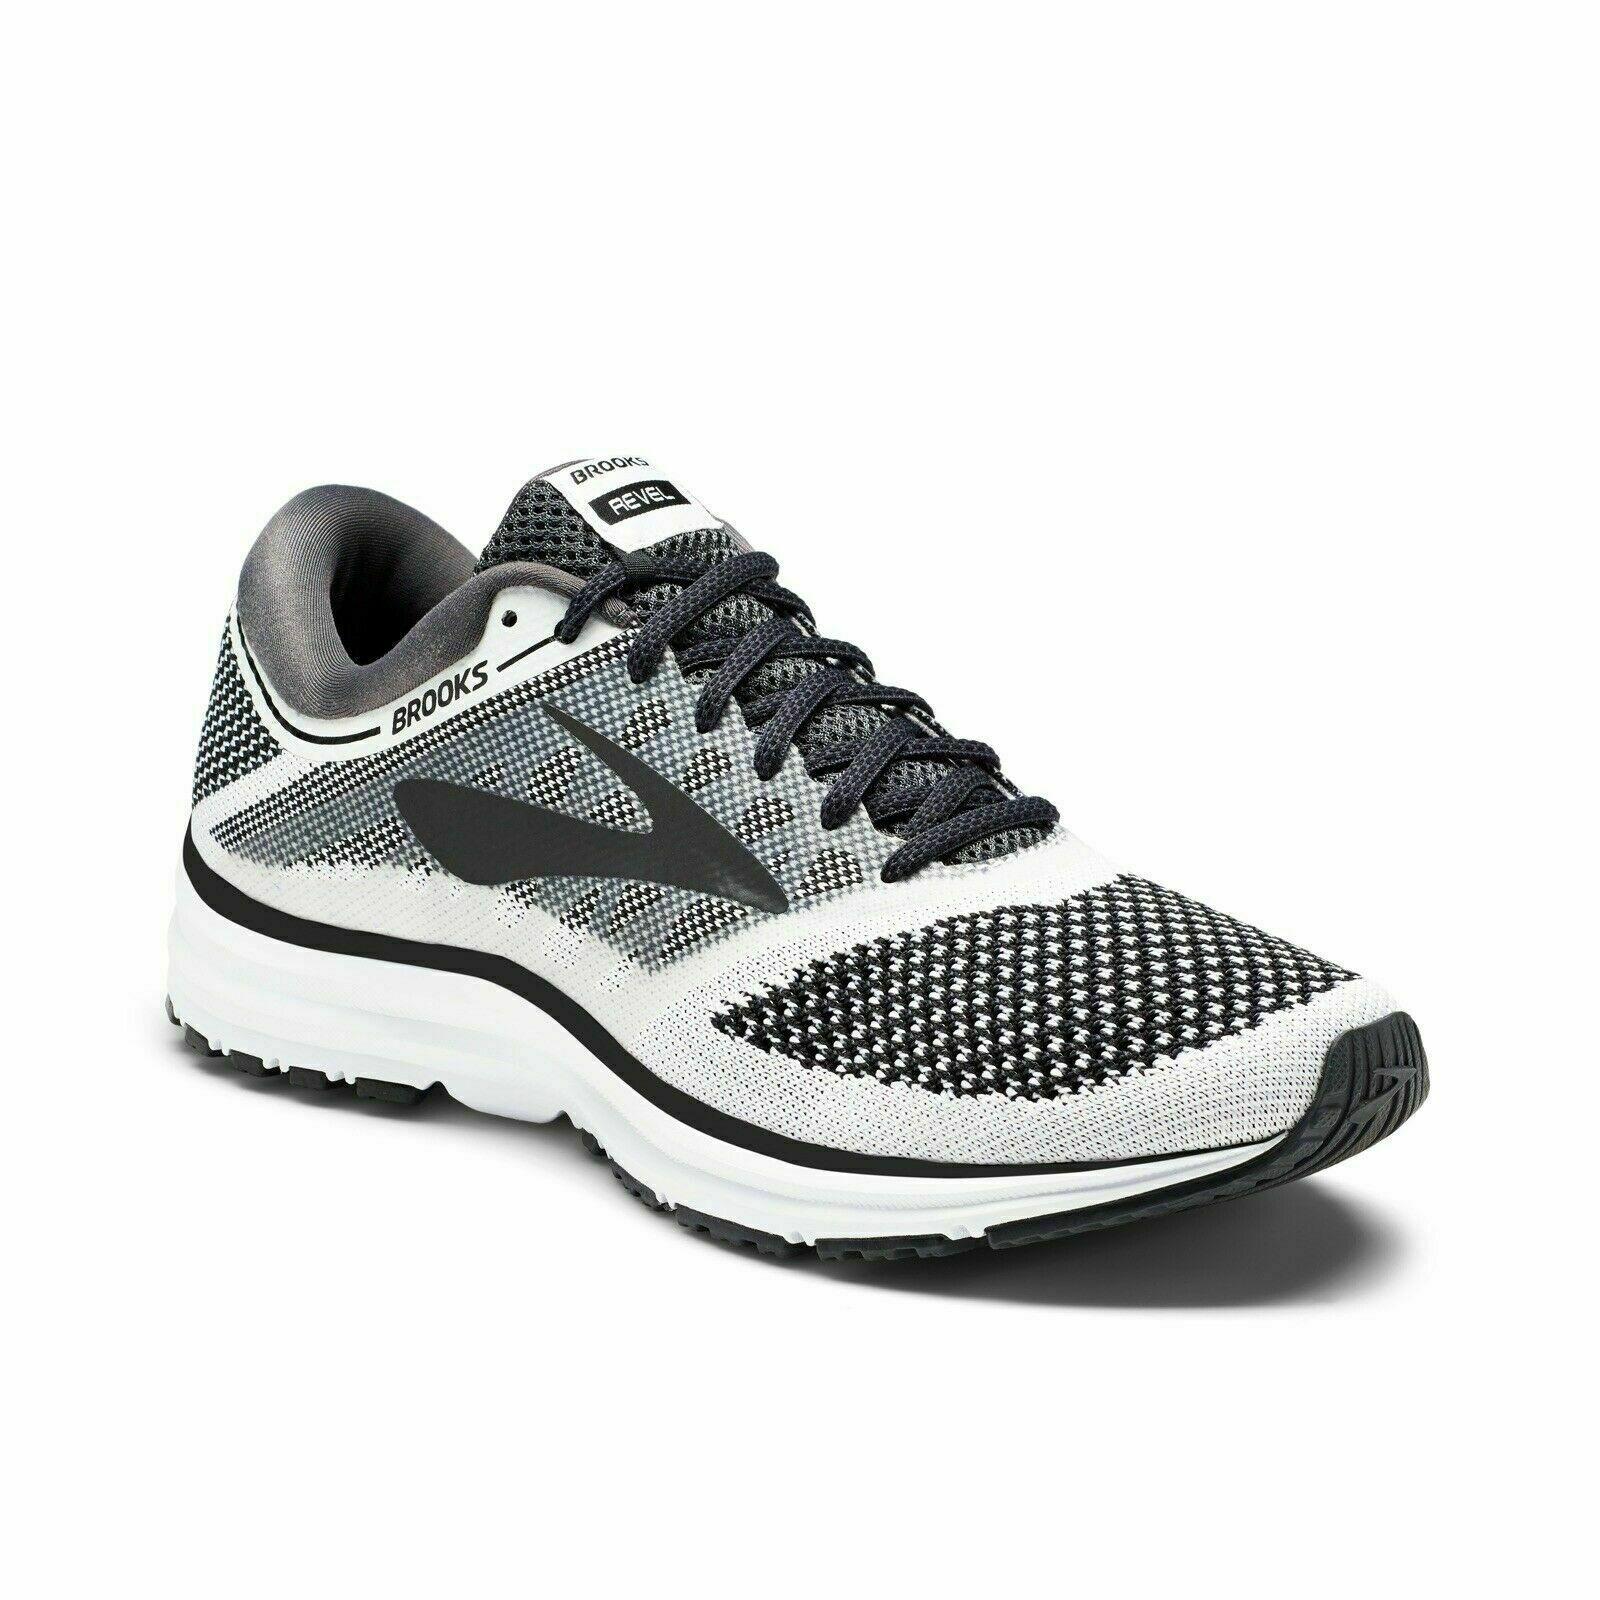 BROOKS Revel Running scarpe 1102601D155 Men's  bianca Anthracite nero